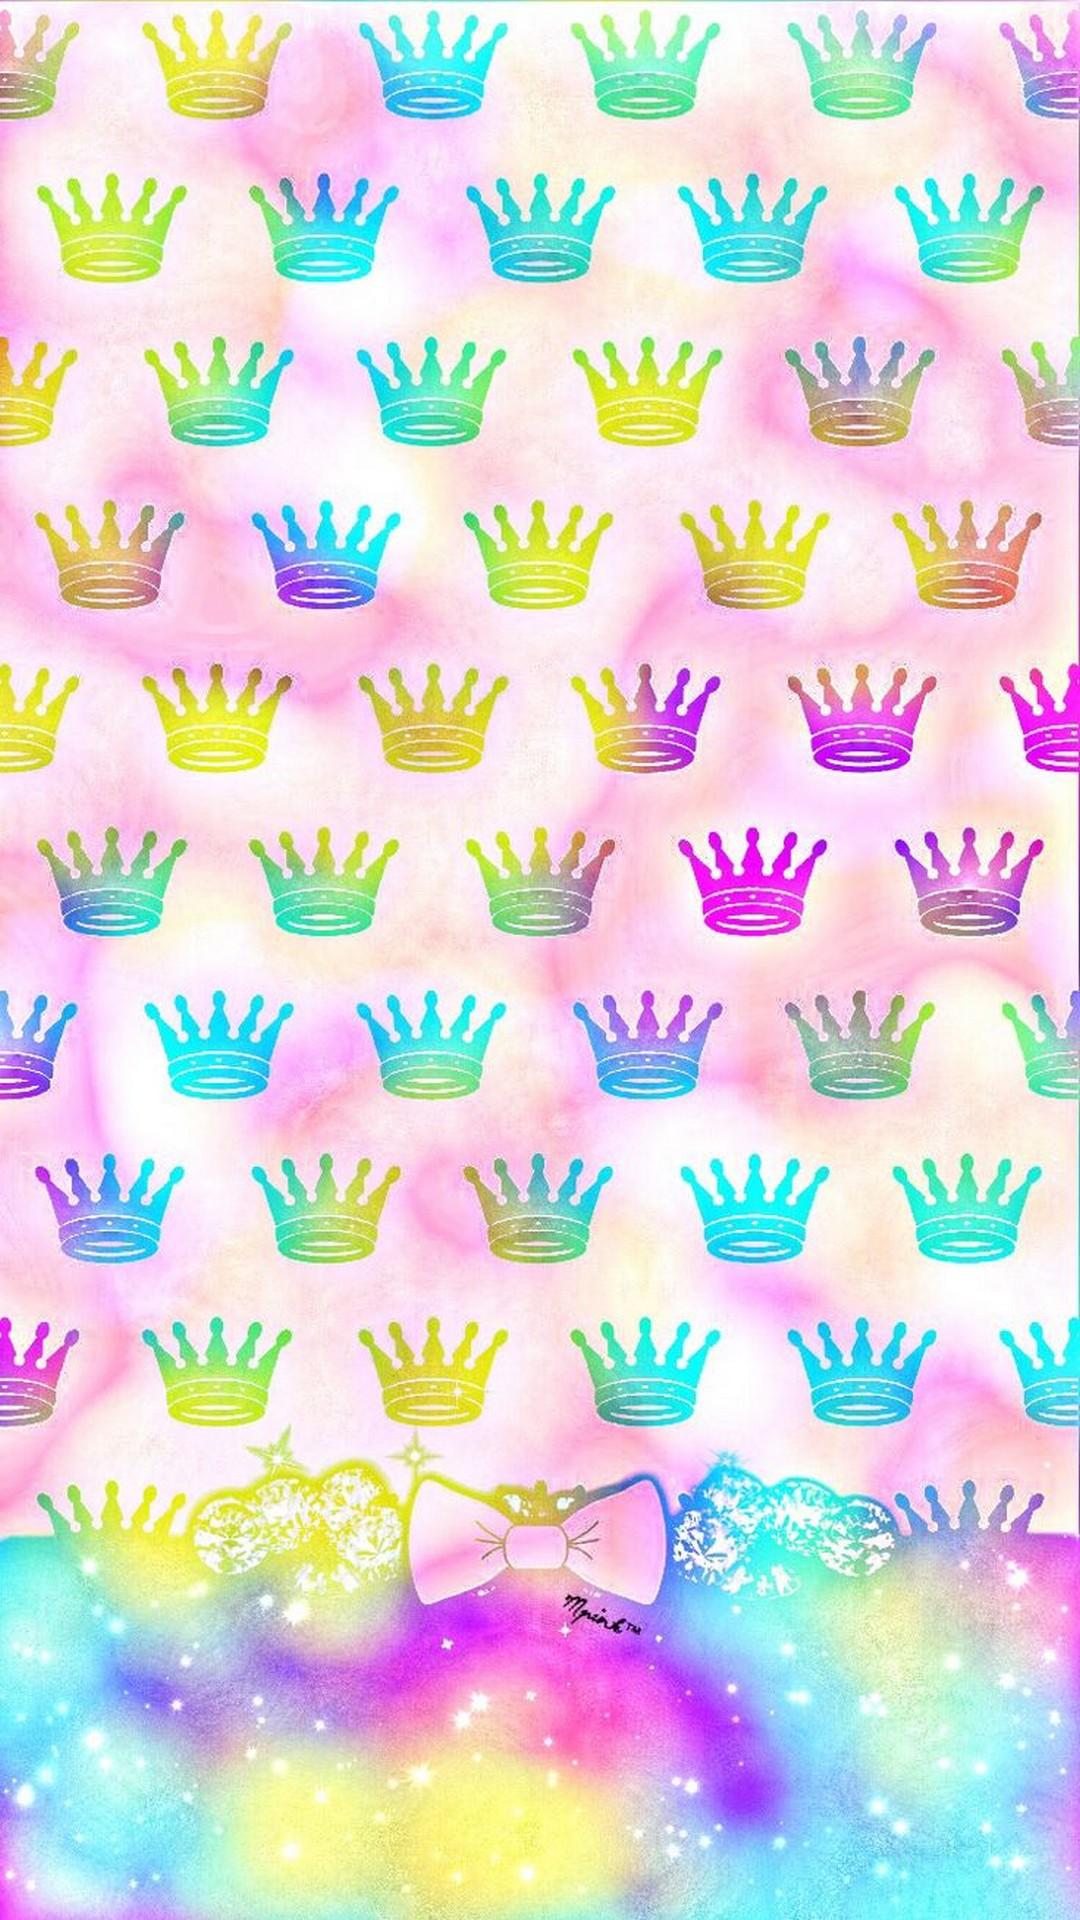 Download Apple Wallpaper Hd For Windows 7 Girly Wallpaper For Iphone 7 Plus 2018 Cute Screensavers